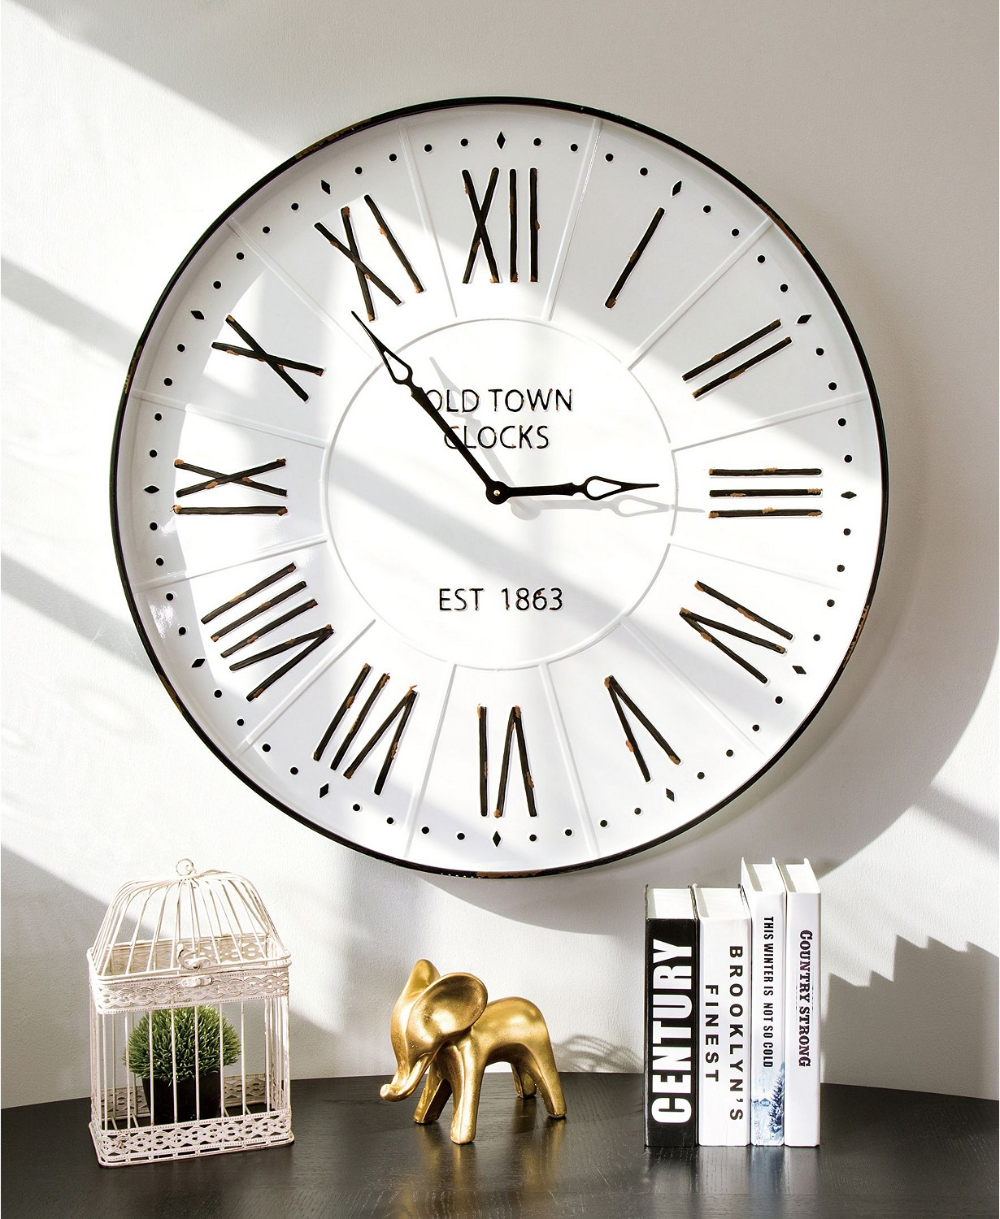 Glitzhome Oversized Farmhouse Metal Enamel Wall Clock Reviews Clocks Home Decor Macy S In 2020 Clock Wall Decor Large Wall Clock Oversized Wall Clock